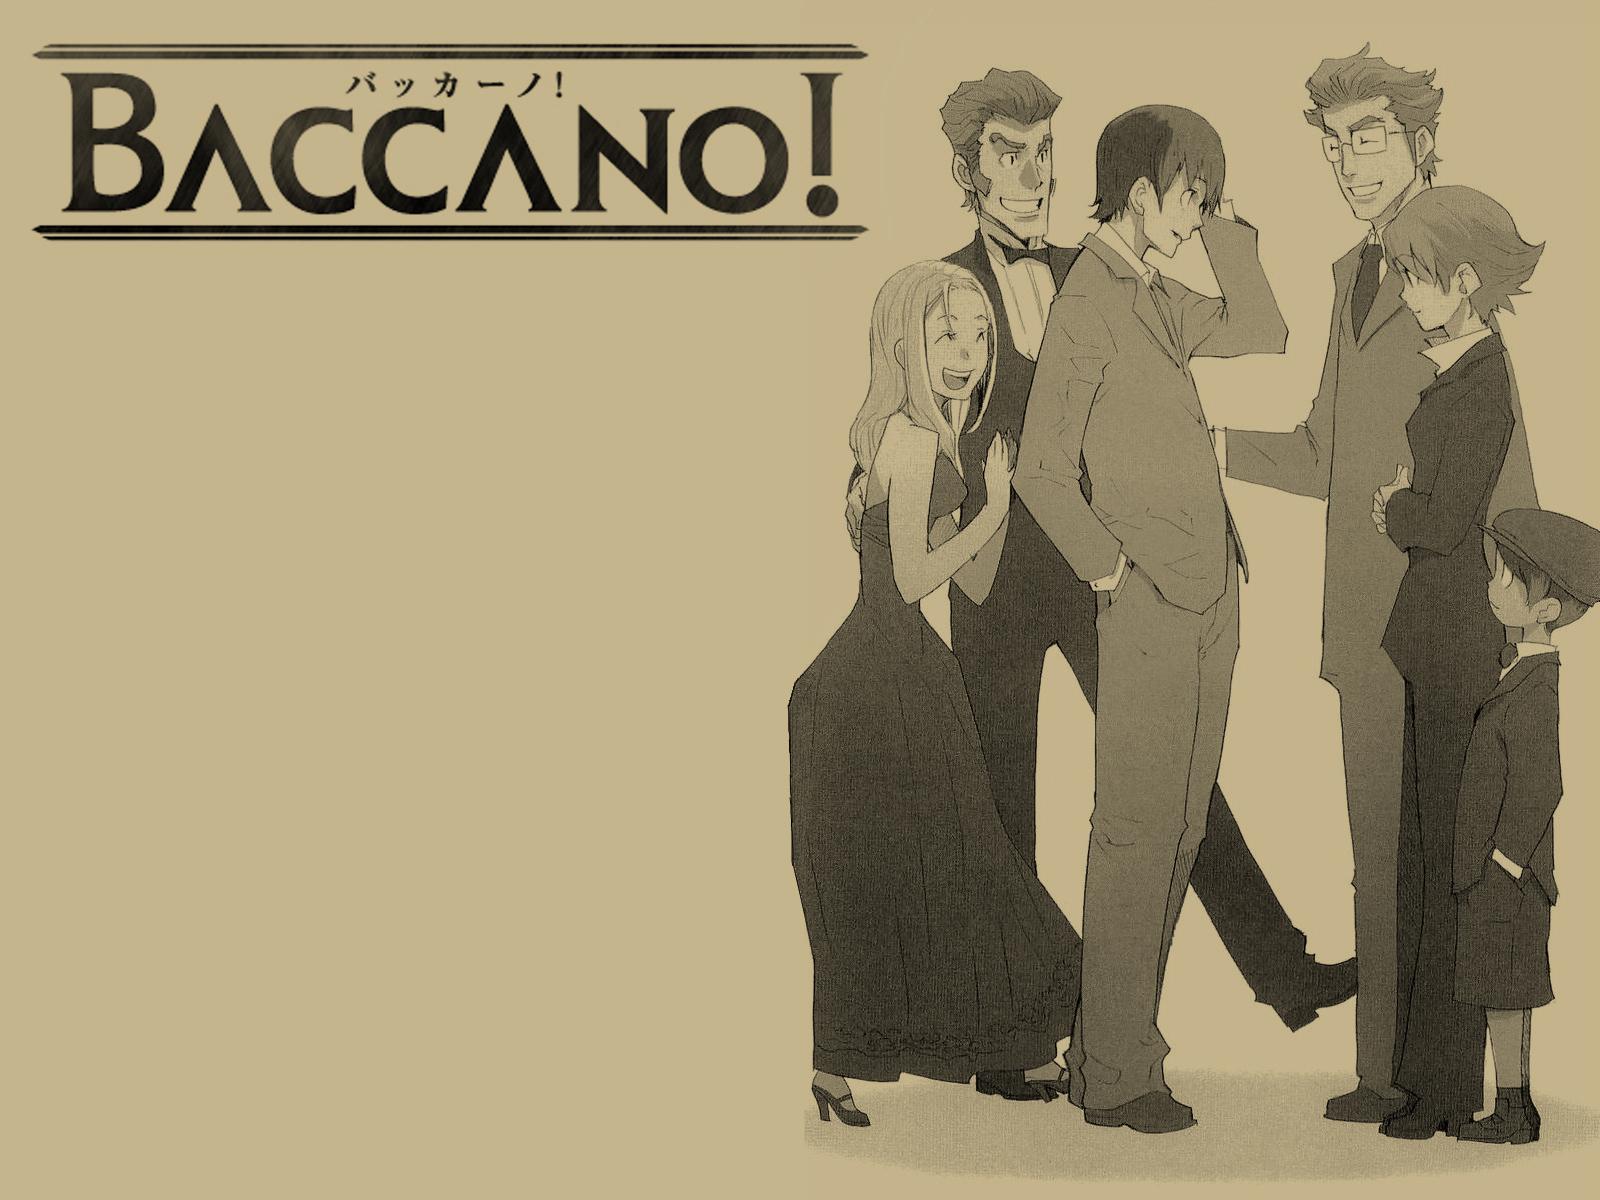 Baccano Wallpaper